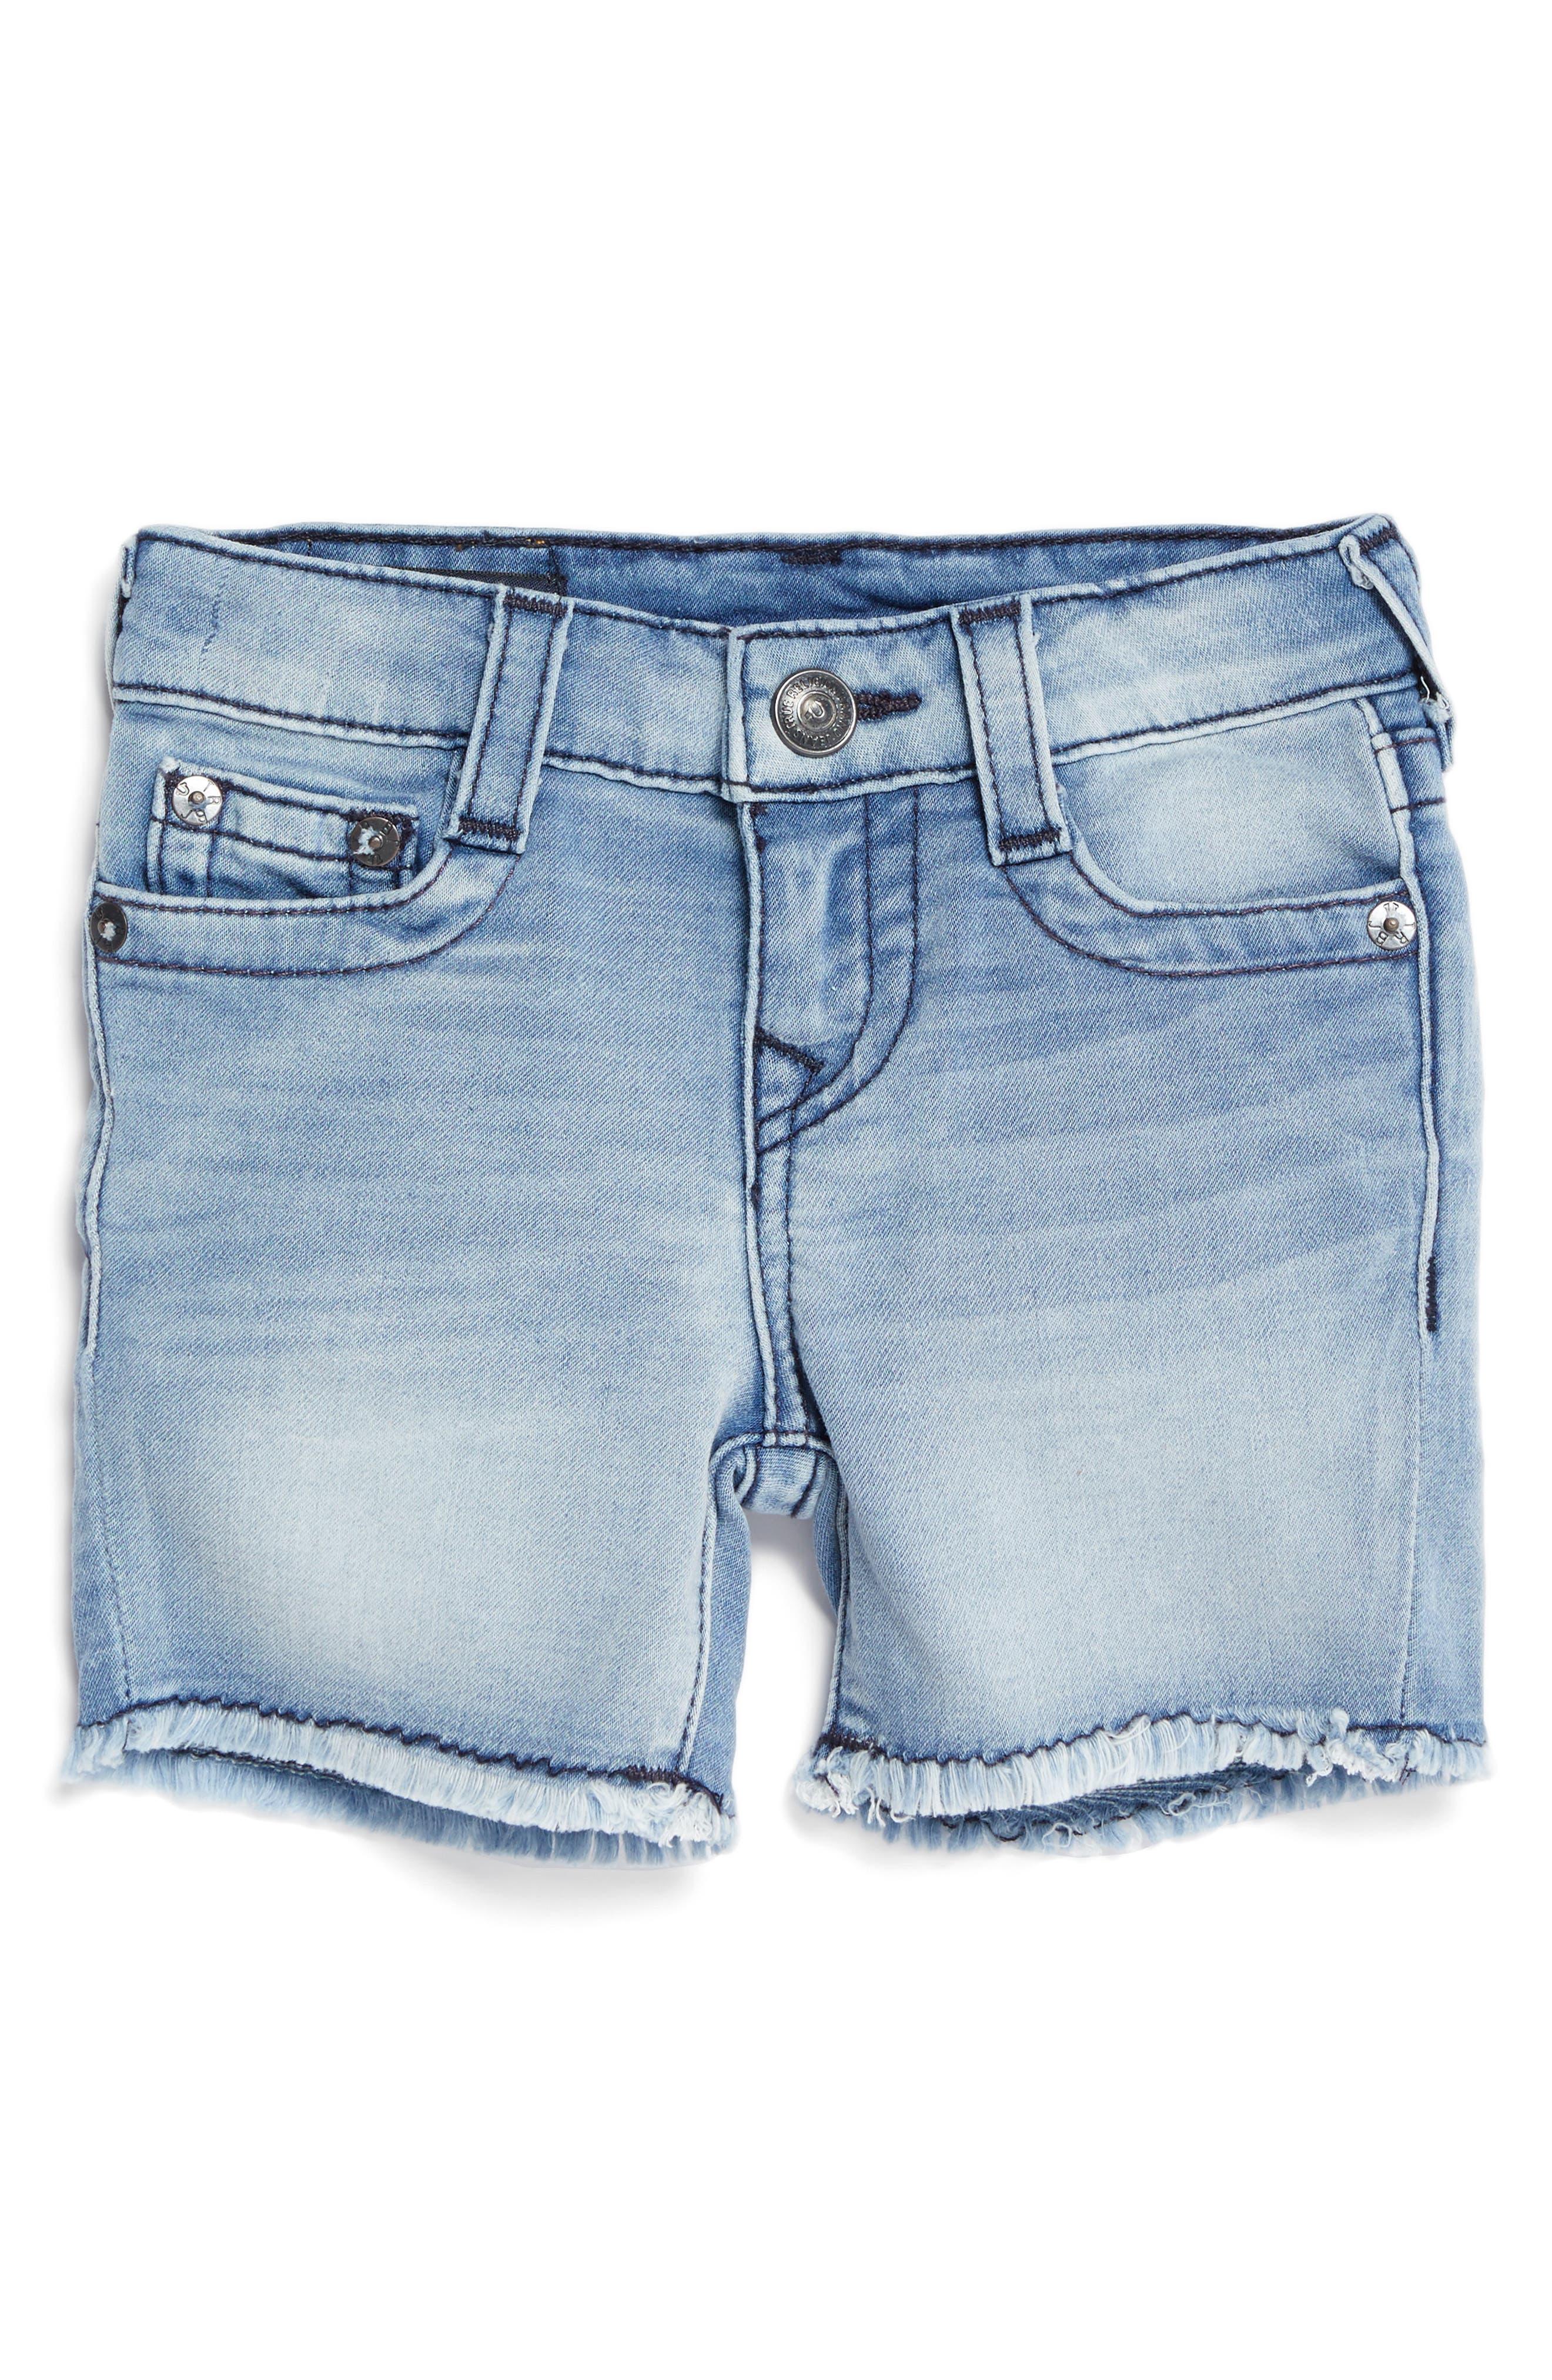 Alternate Image 1 Selected - True Religion Geno Denim Shorts (Baby)